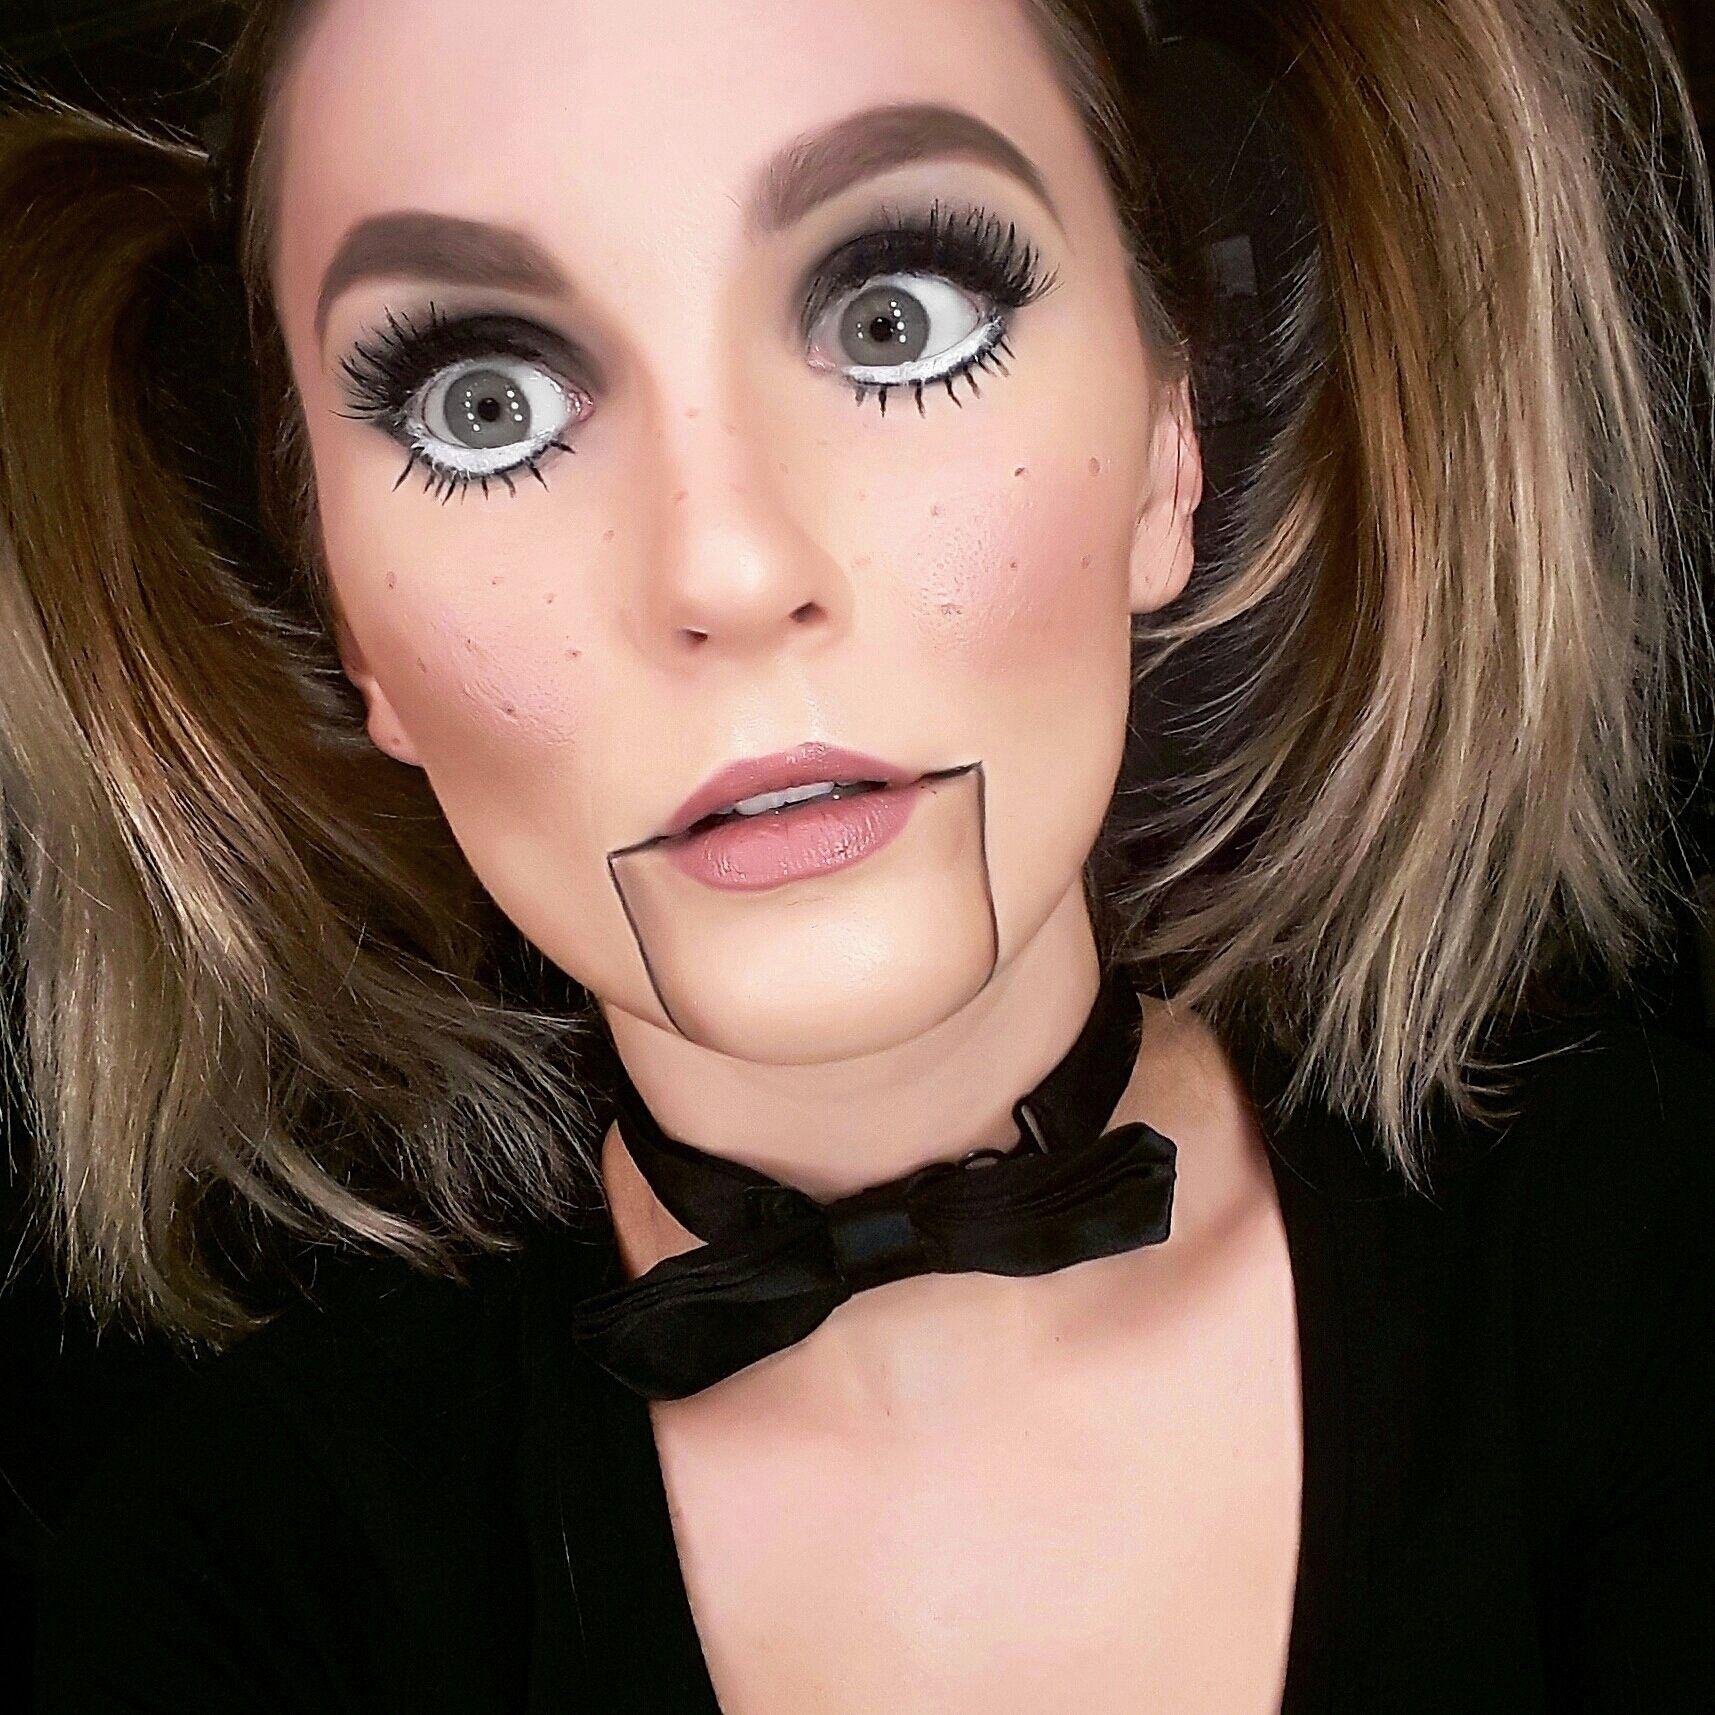 Dummy Halloween Makeup Halloween Makeup Pretty Halloween Makeup Looks Cute Halloween Makeup